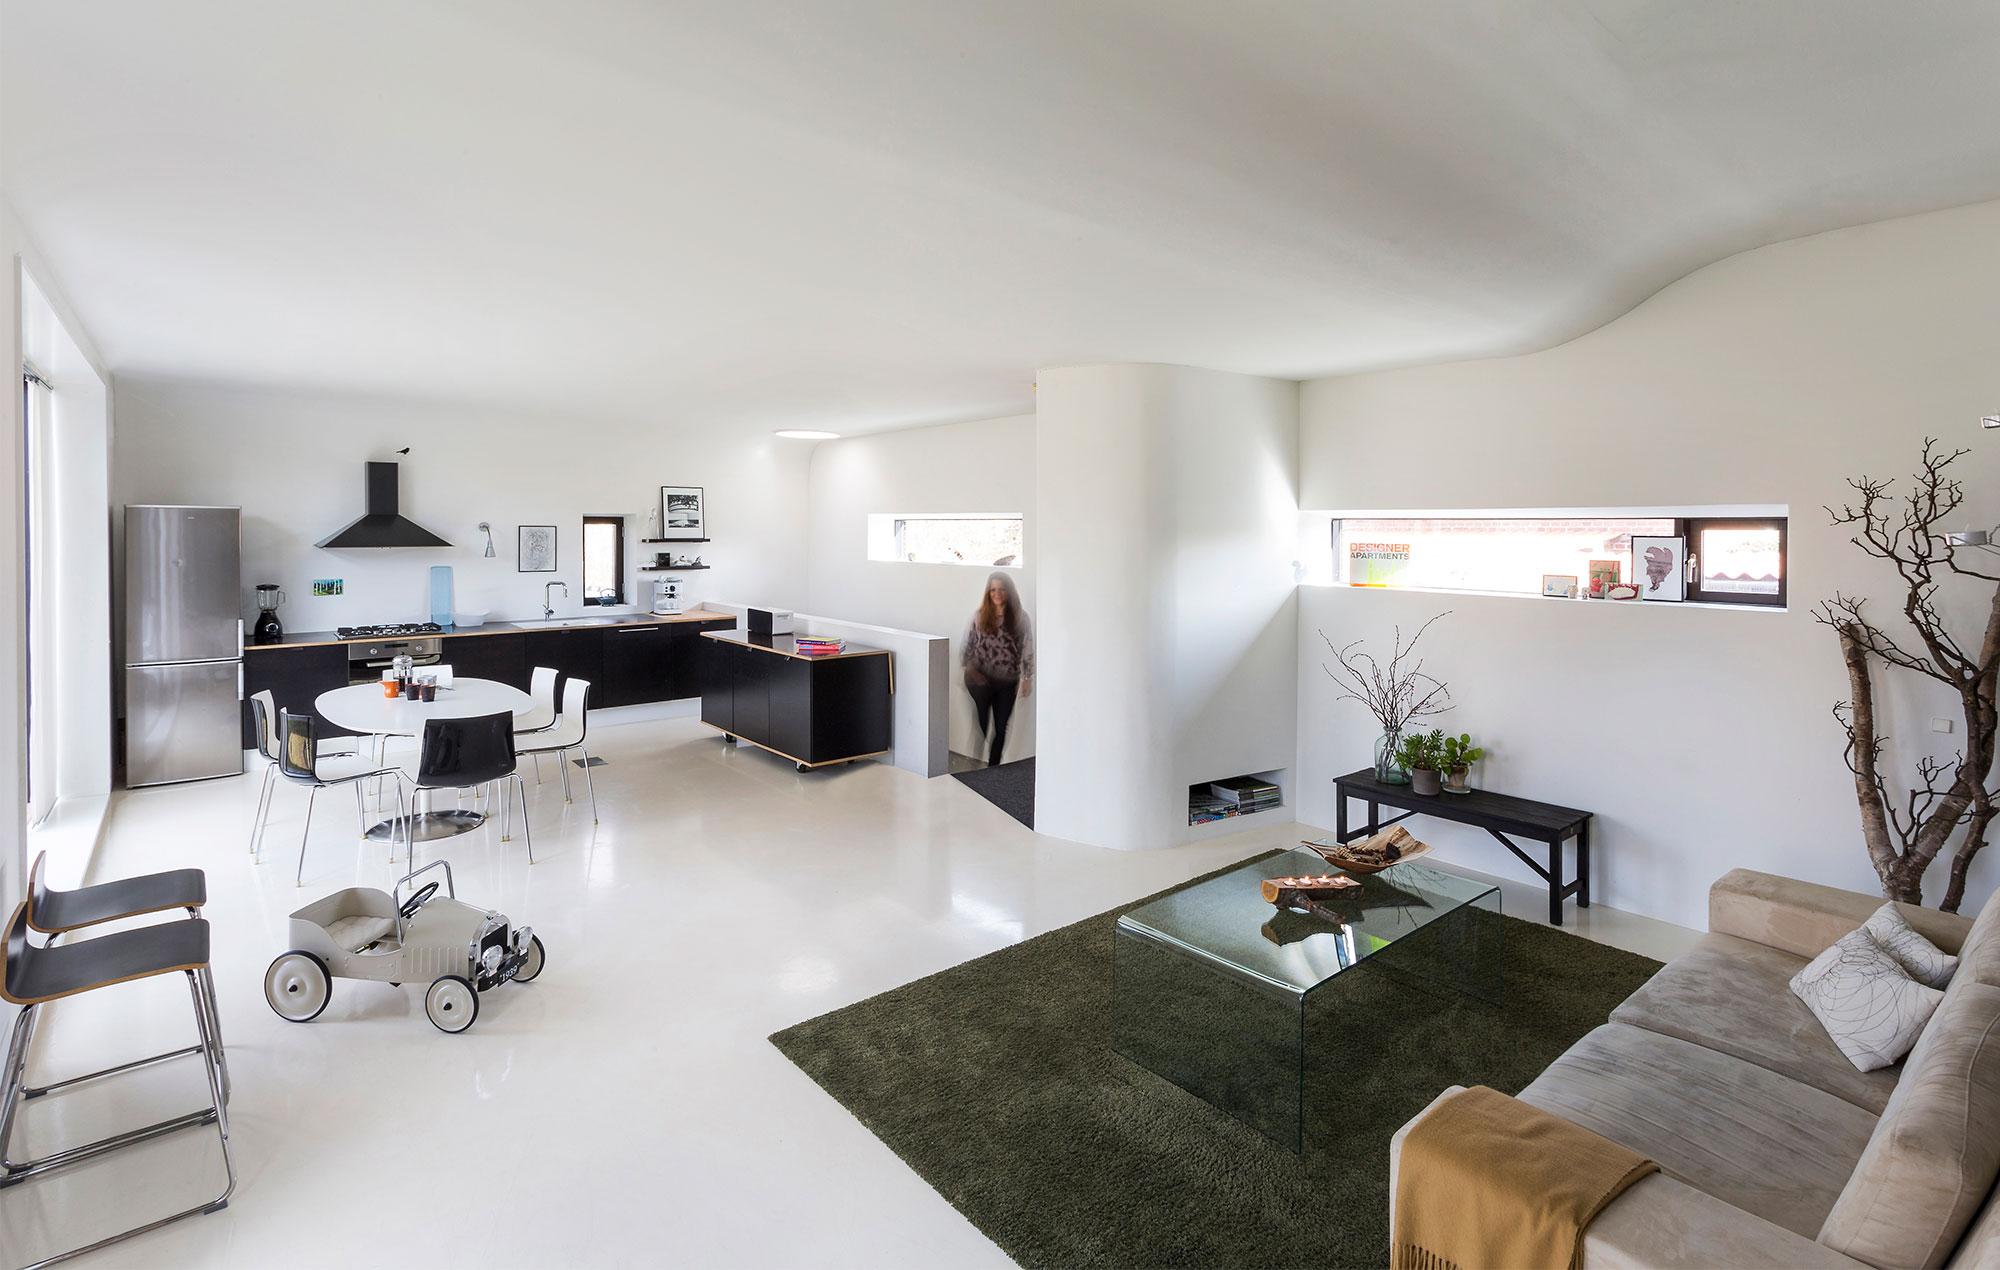 Arkitekternes togvogn i træ og beton - Danske Boligarkitekter